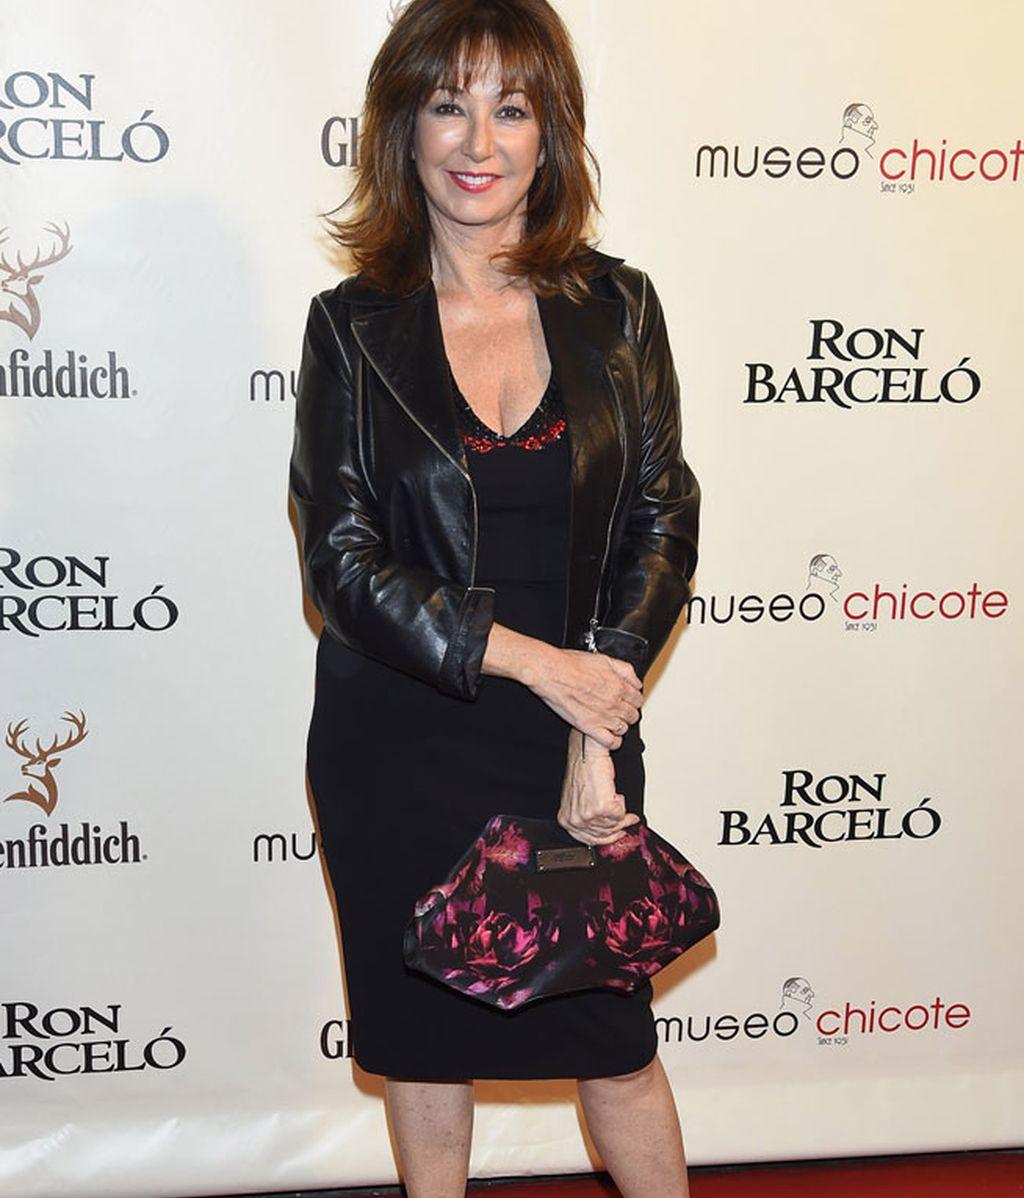 Ana Rosa Quintana recibió el premio a su trayectoria profeisonal